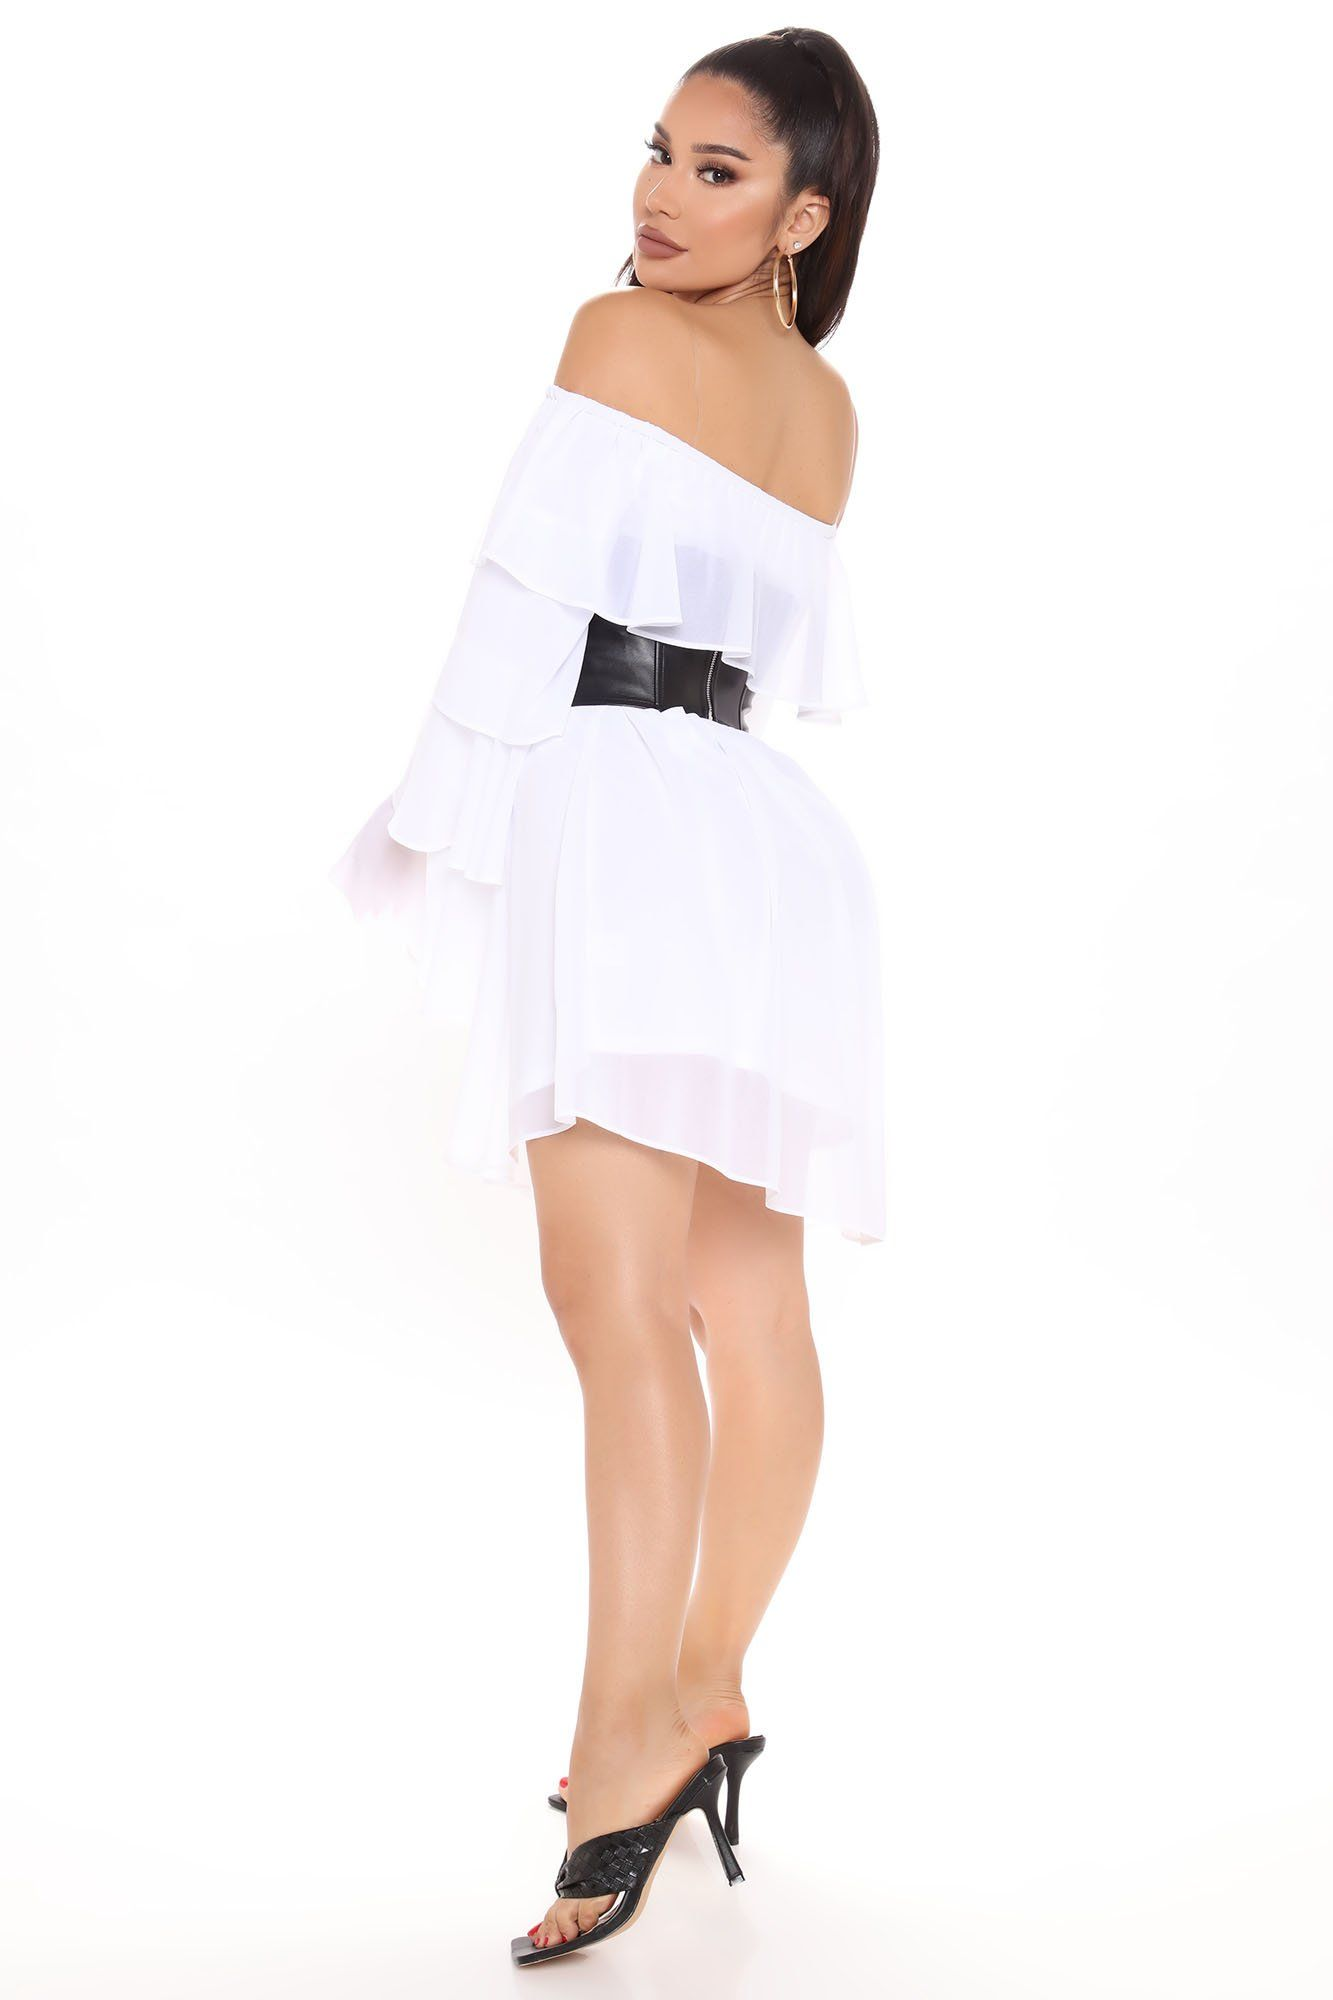 Second Chance Corset Mini Dress White Black In 2021 White Mini Dress Mini Dress Woman Suit Fashion [ 2000 x 1333 Pixel ]